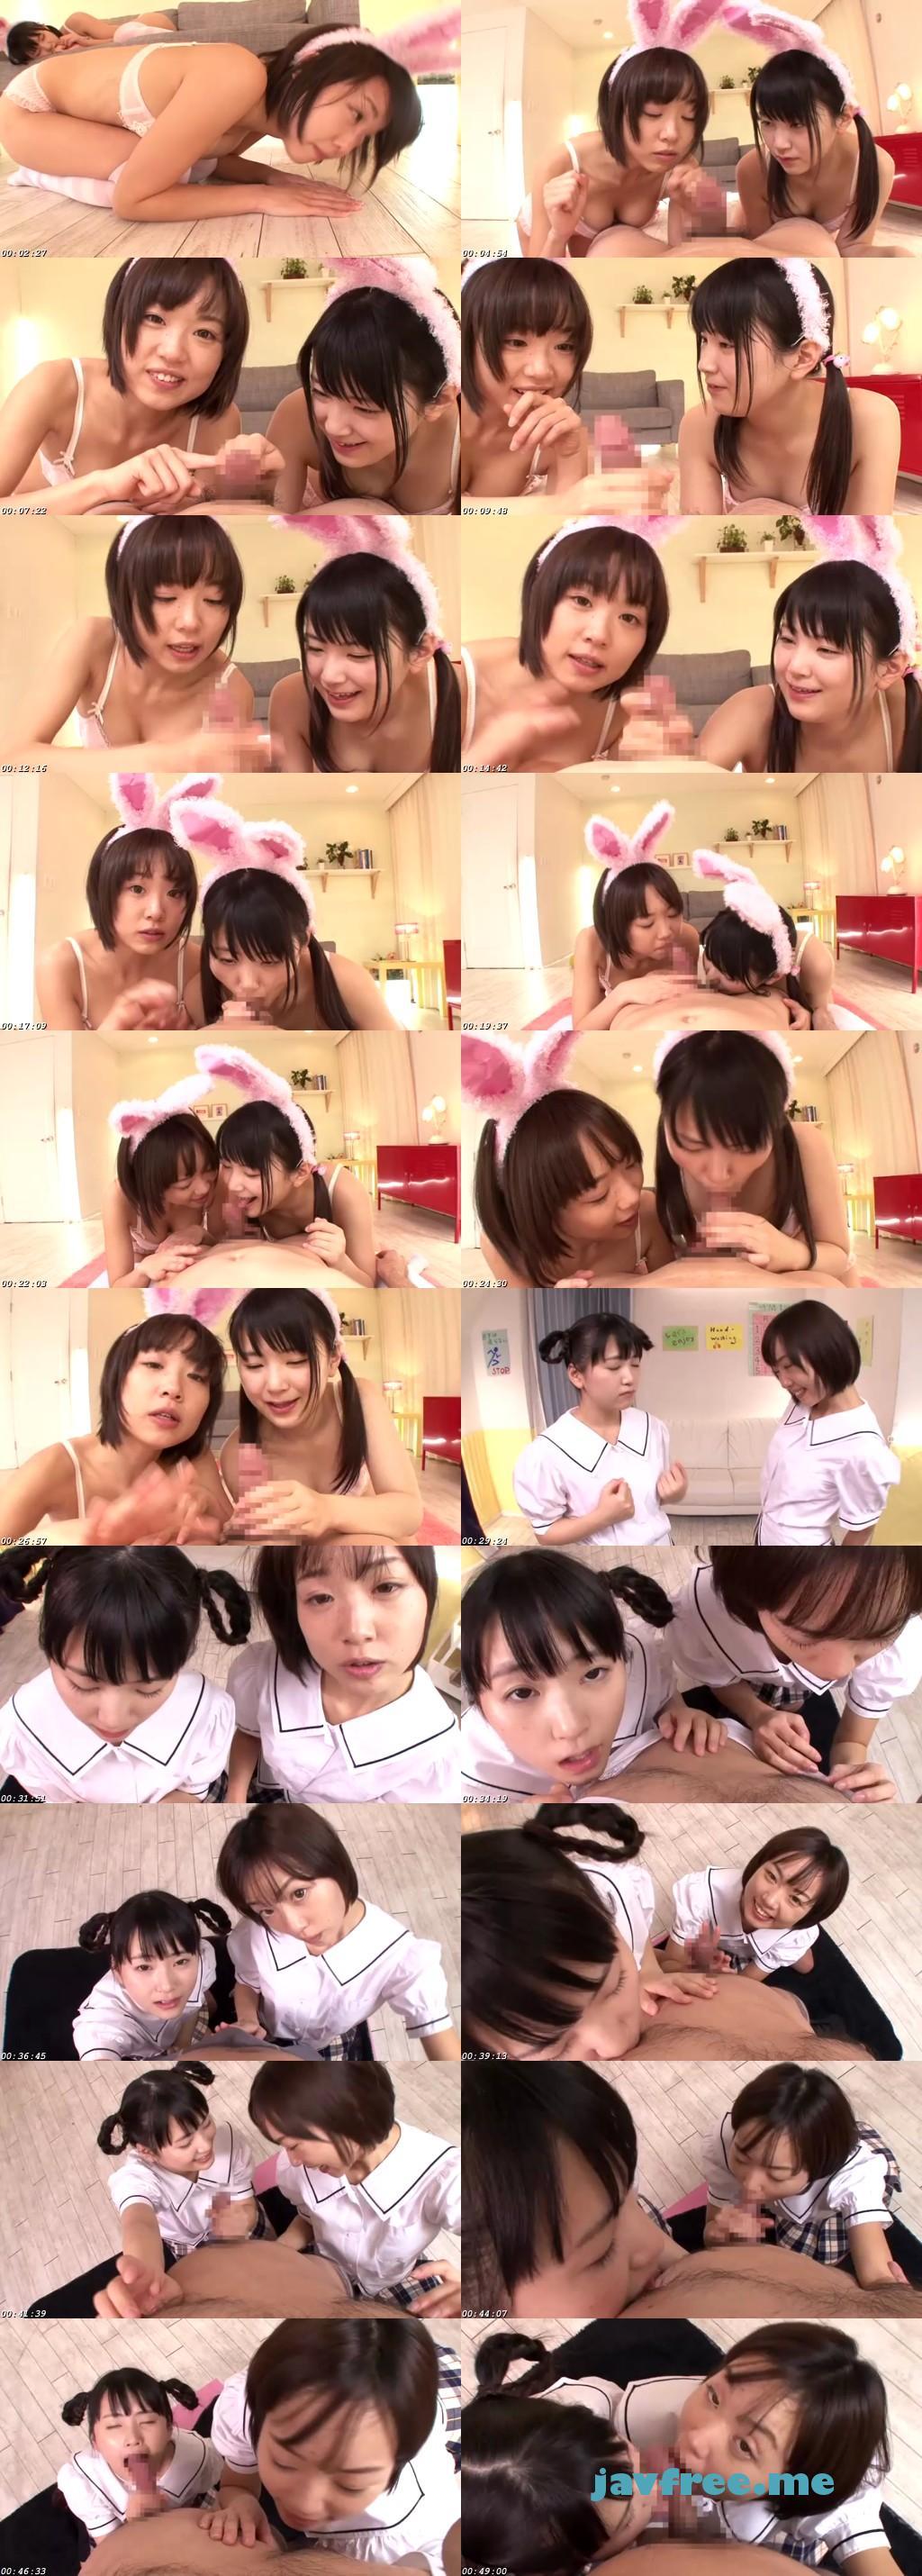 [MUM 061] 小さい女の子をひとりじめ。らぶとつなの200%ロ○ータ淫語。 mum